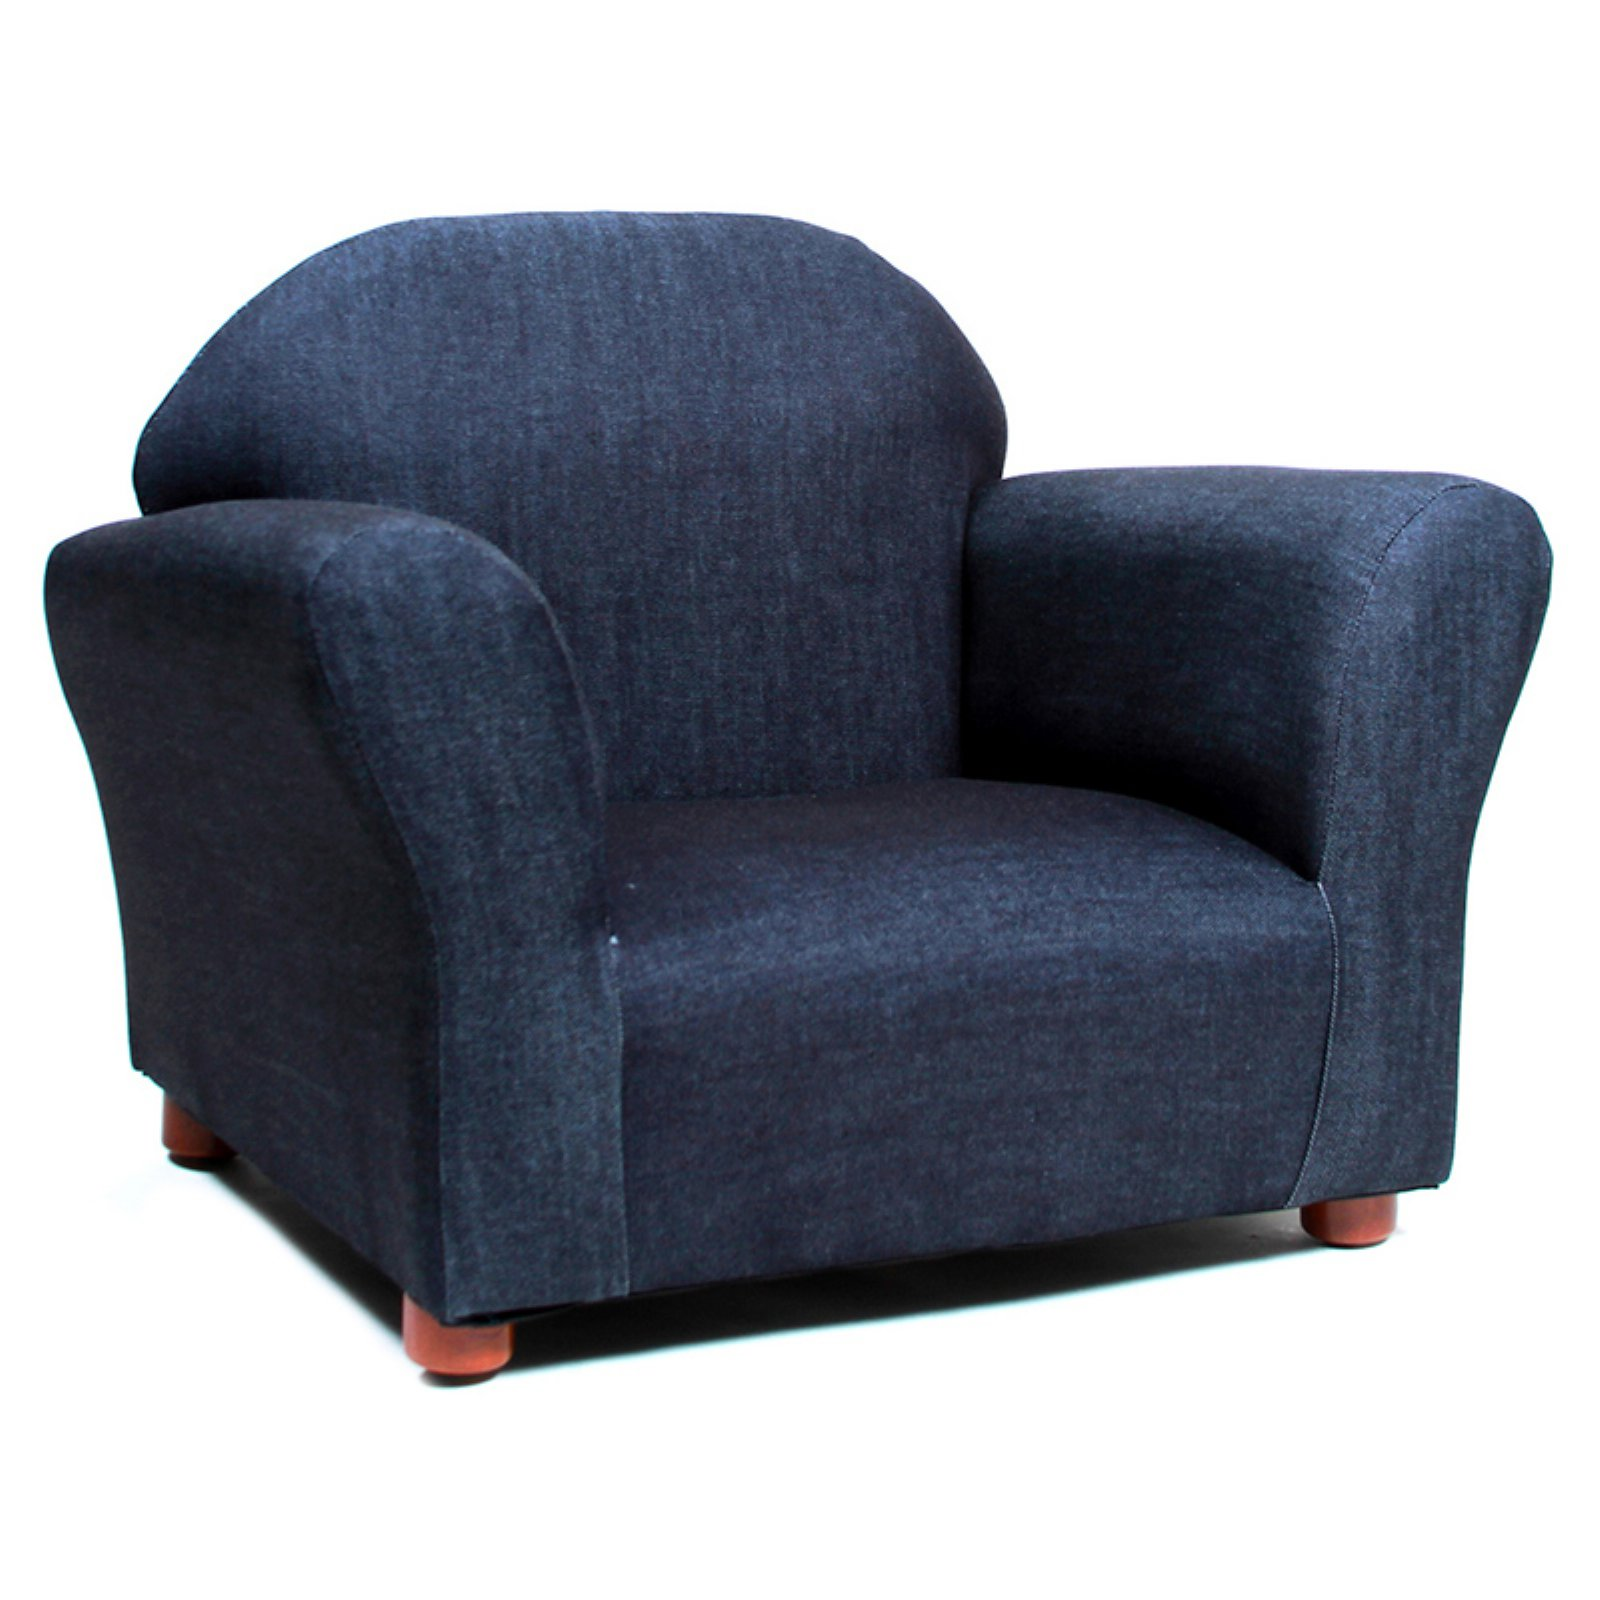 Fantasy Keep Roundy Denim Kids Chair